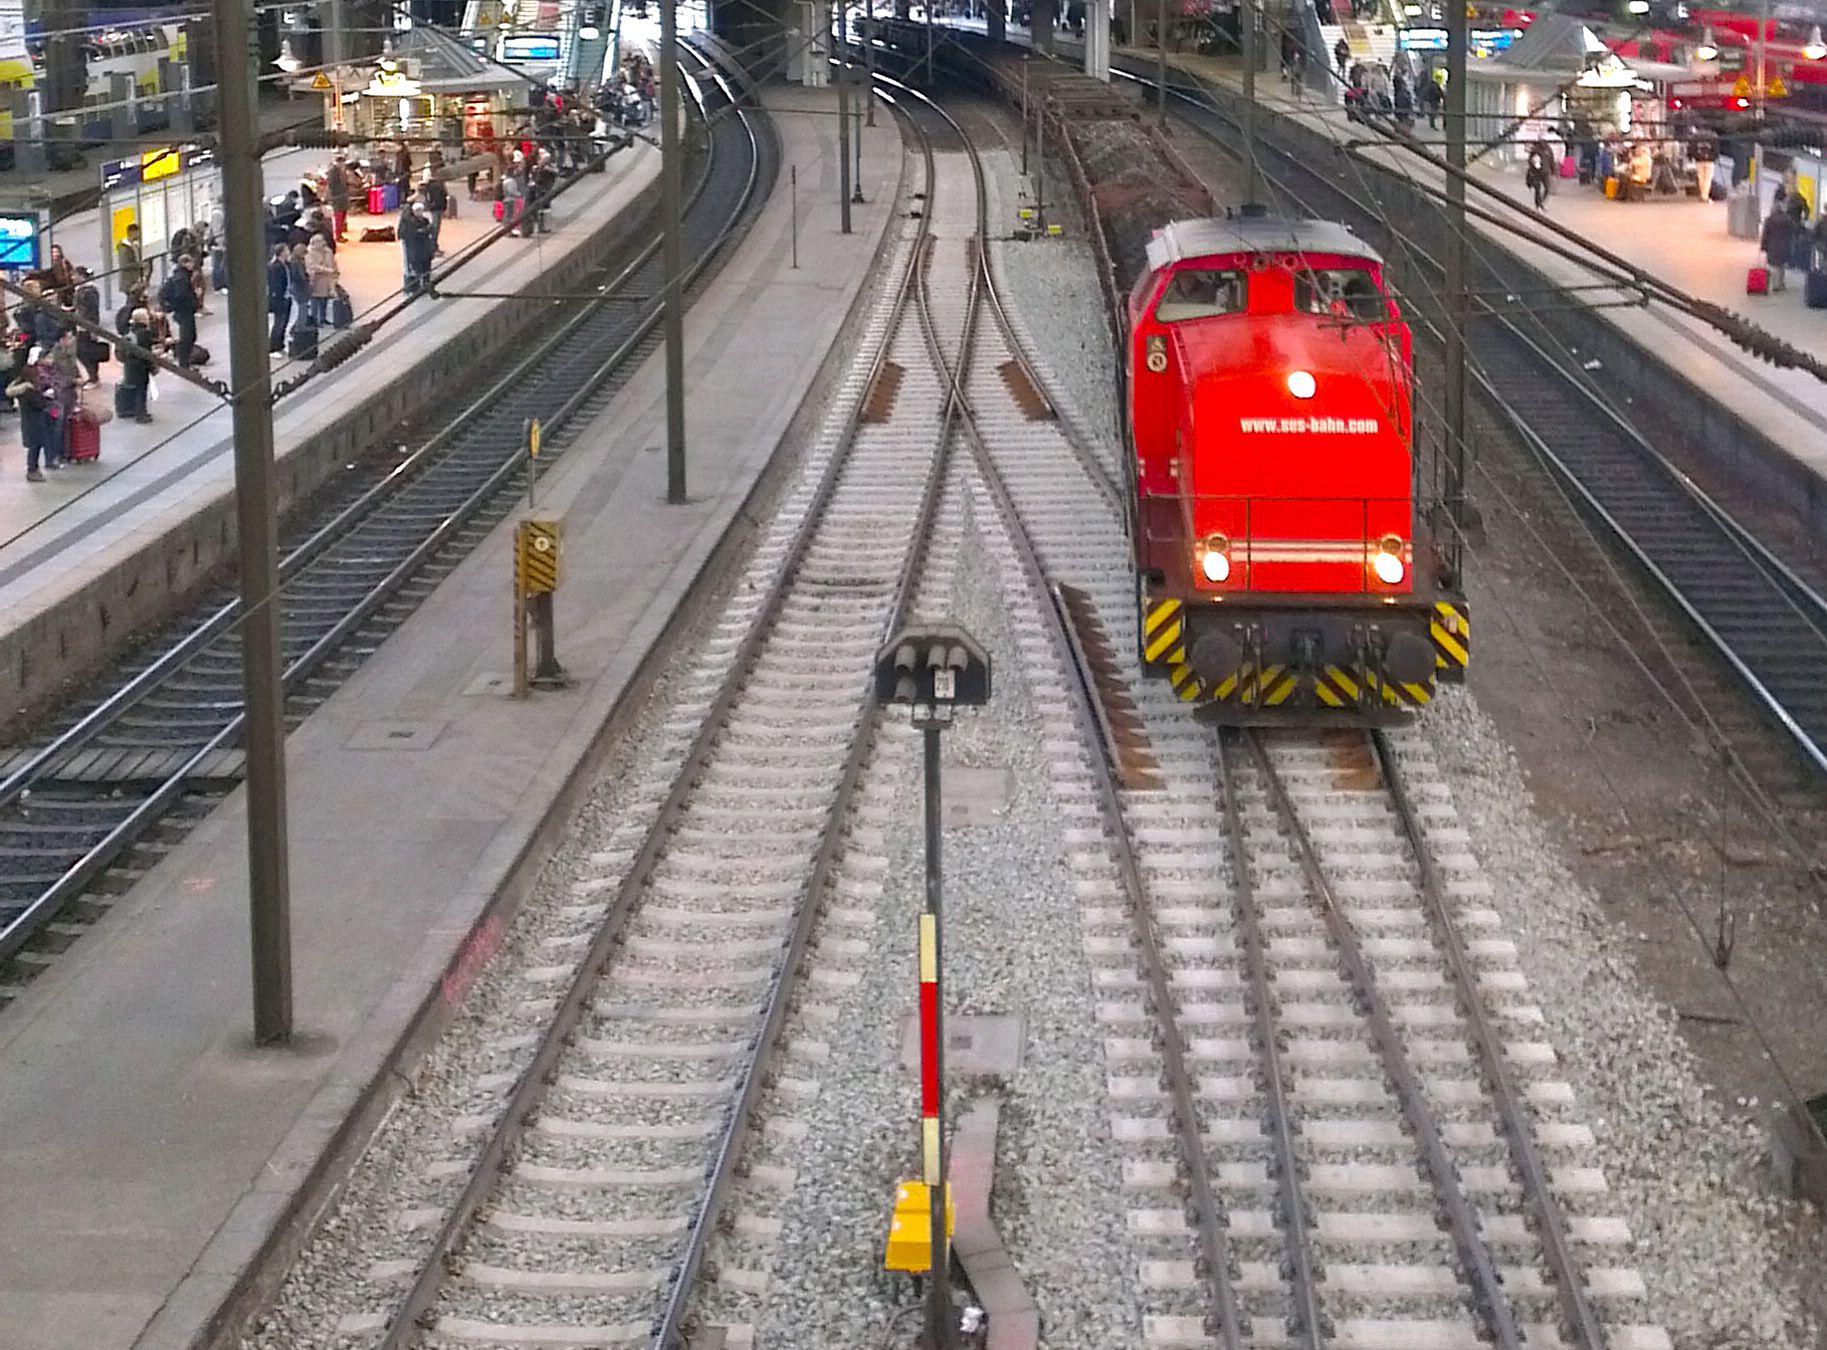 Construction works at Hauptbahnhof